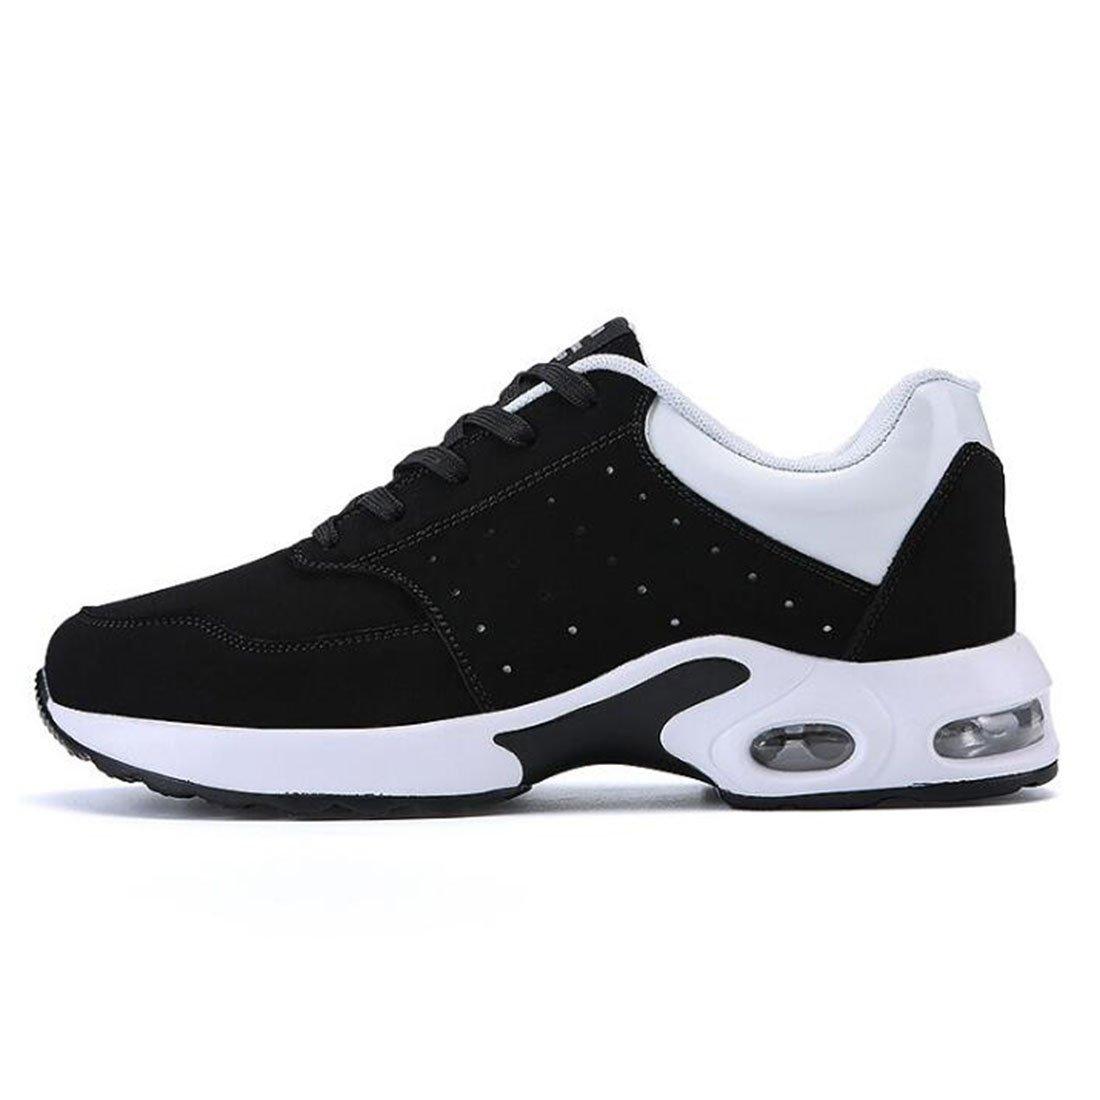 Zapatos De Pareja De Primavera Zapatos Deportivos Transpirables Ocasionales 41.5 EU|Blackwhite